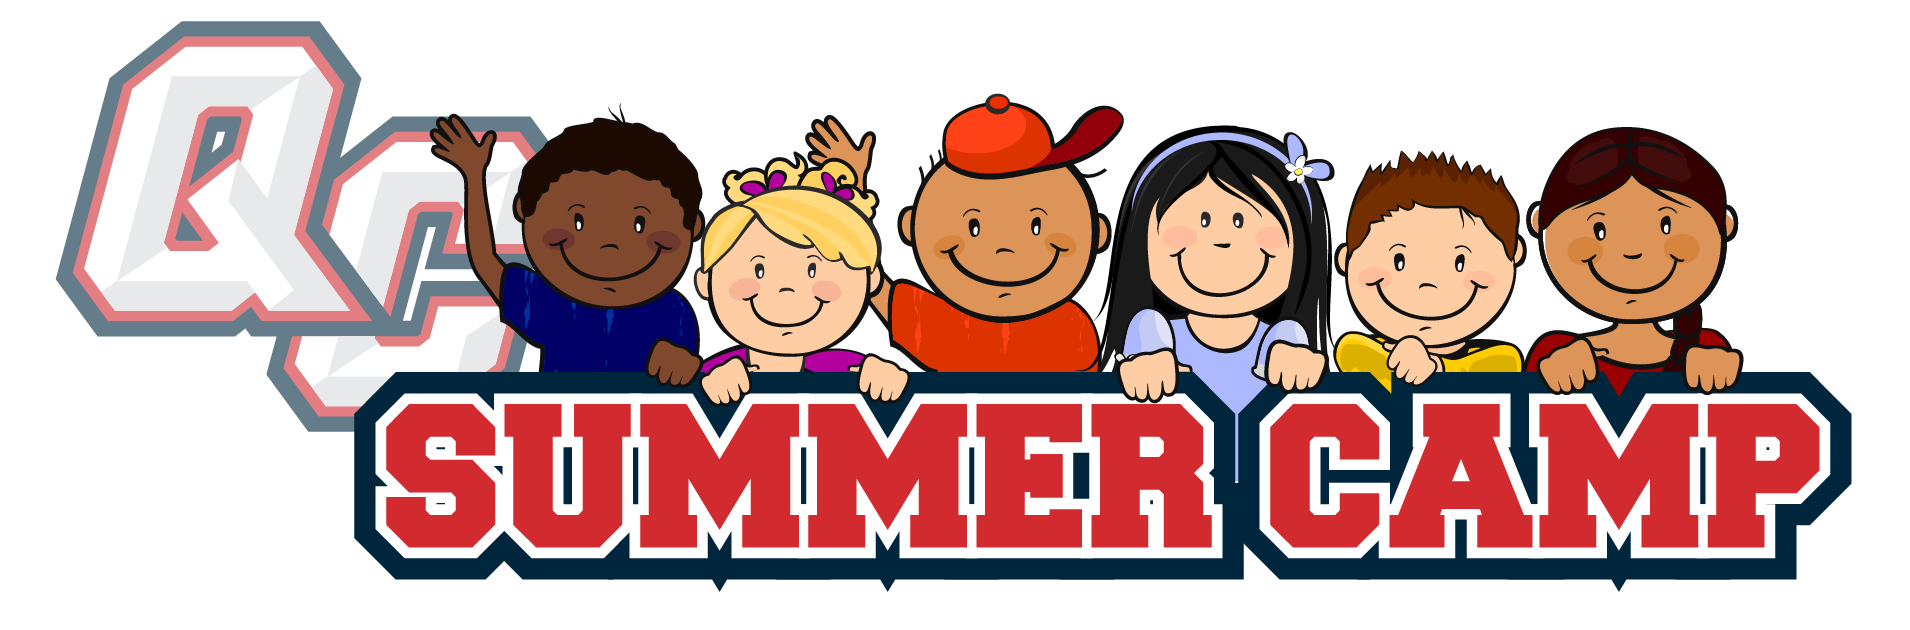 Teen clipart peer counseling. Summer program queens college